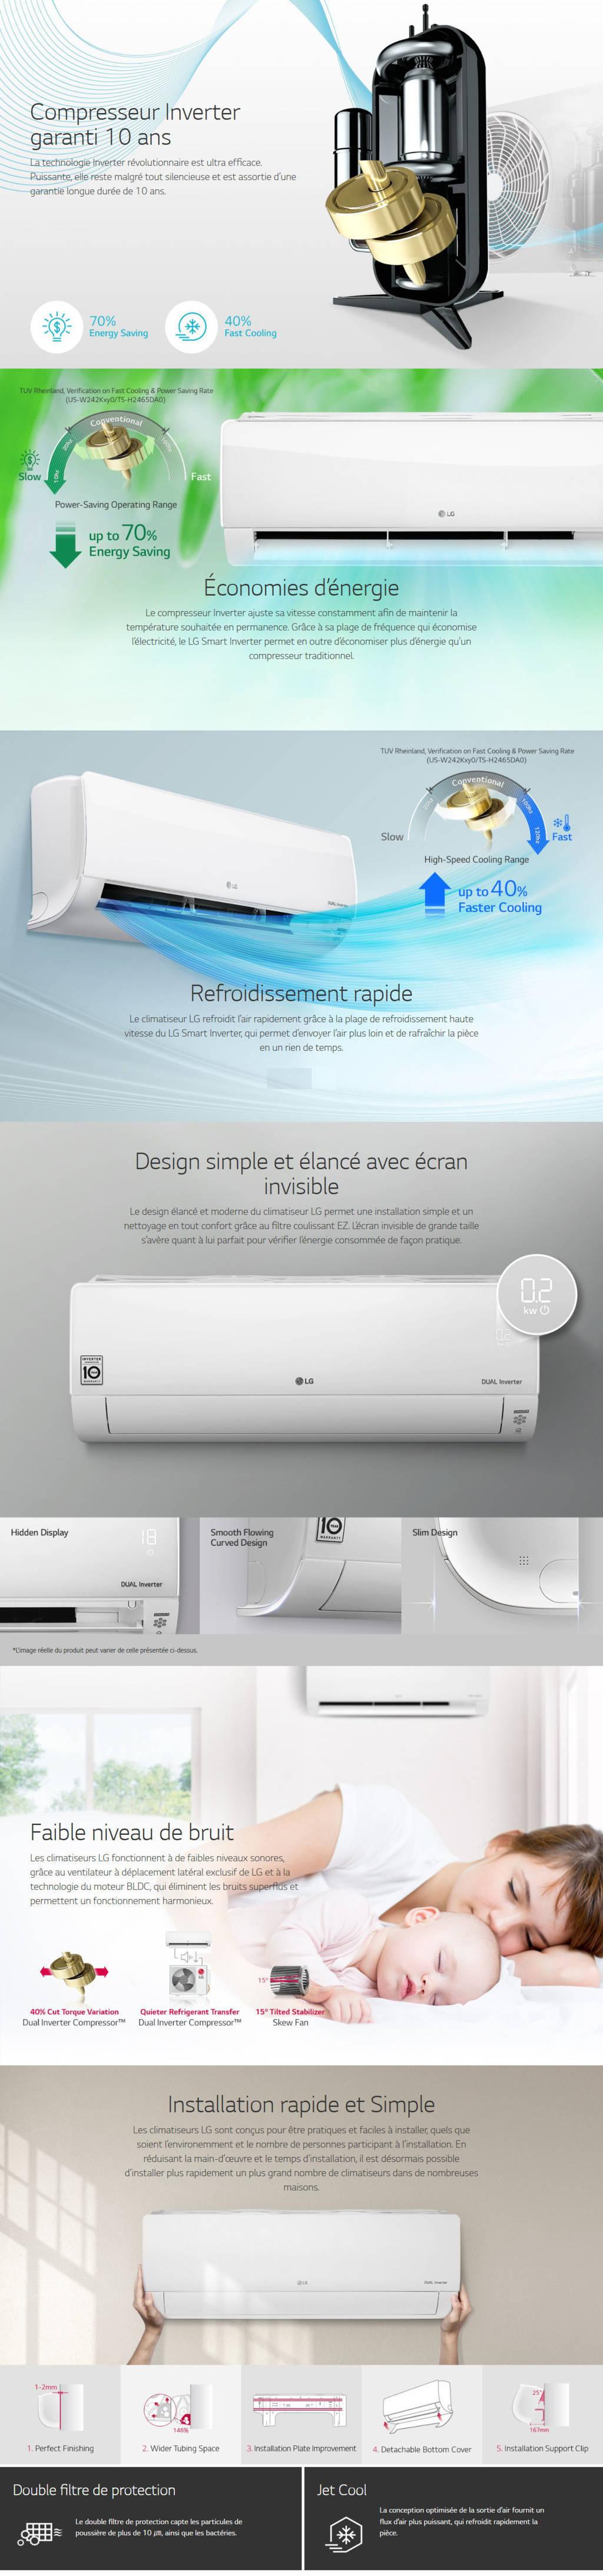 climatisation-lg-mural-standard